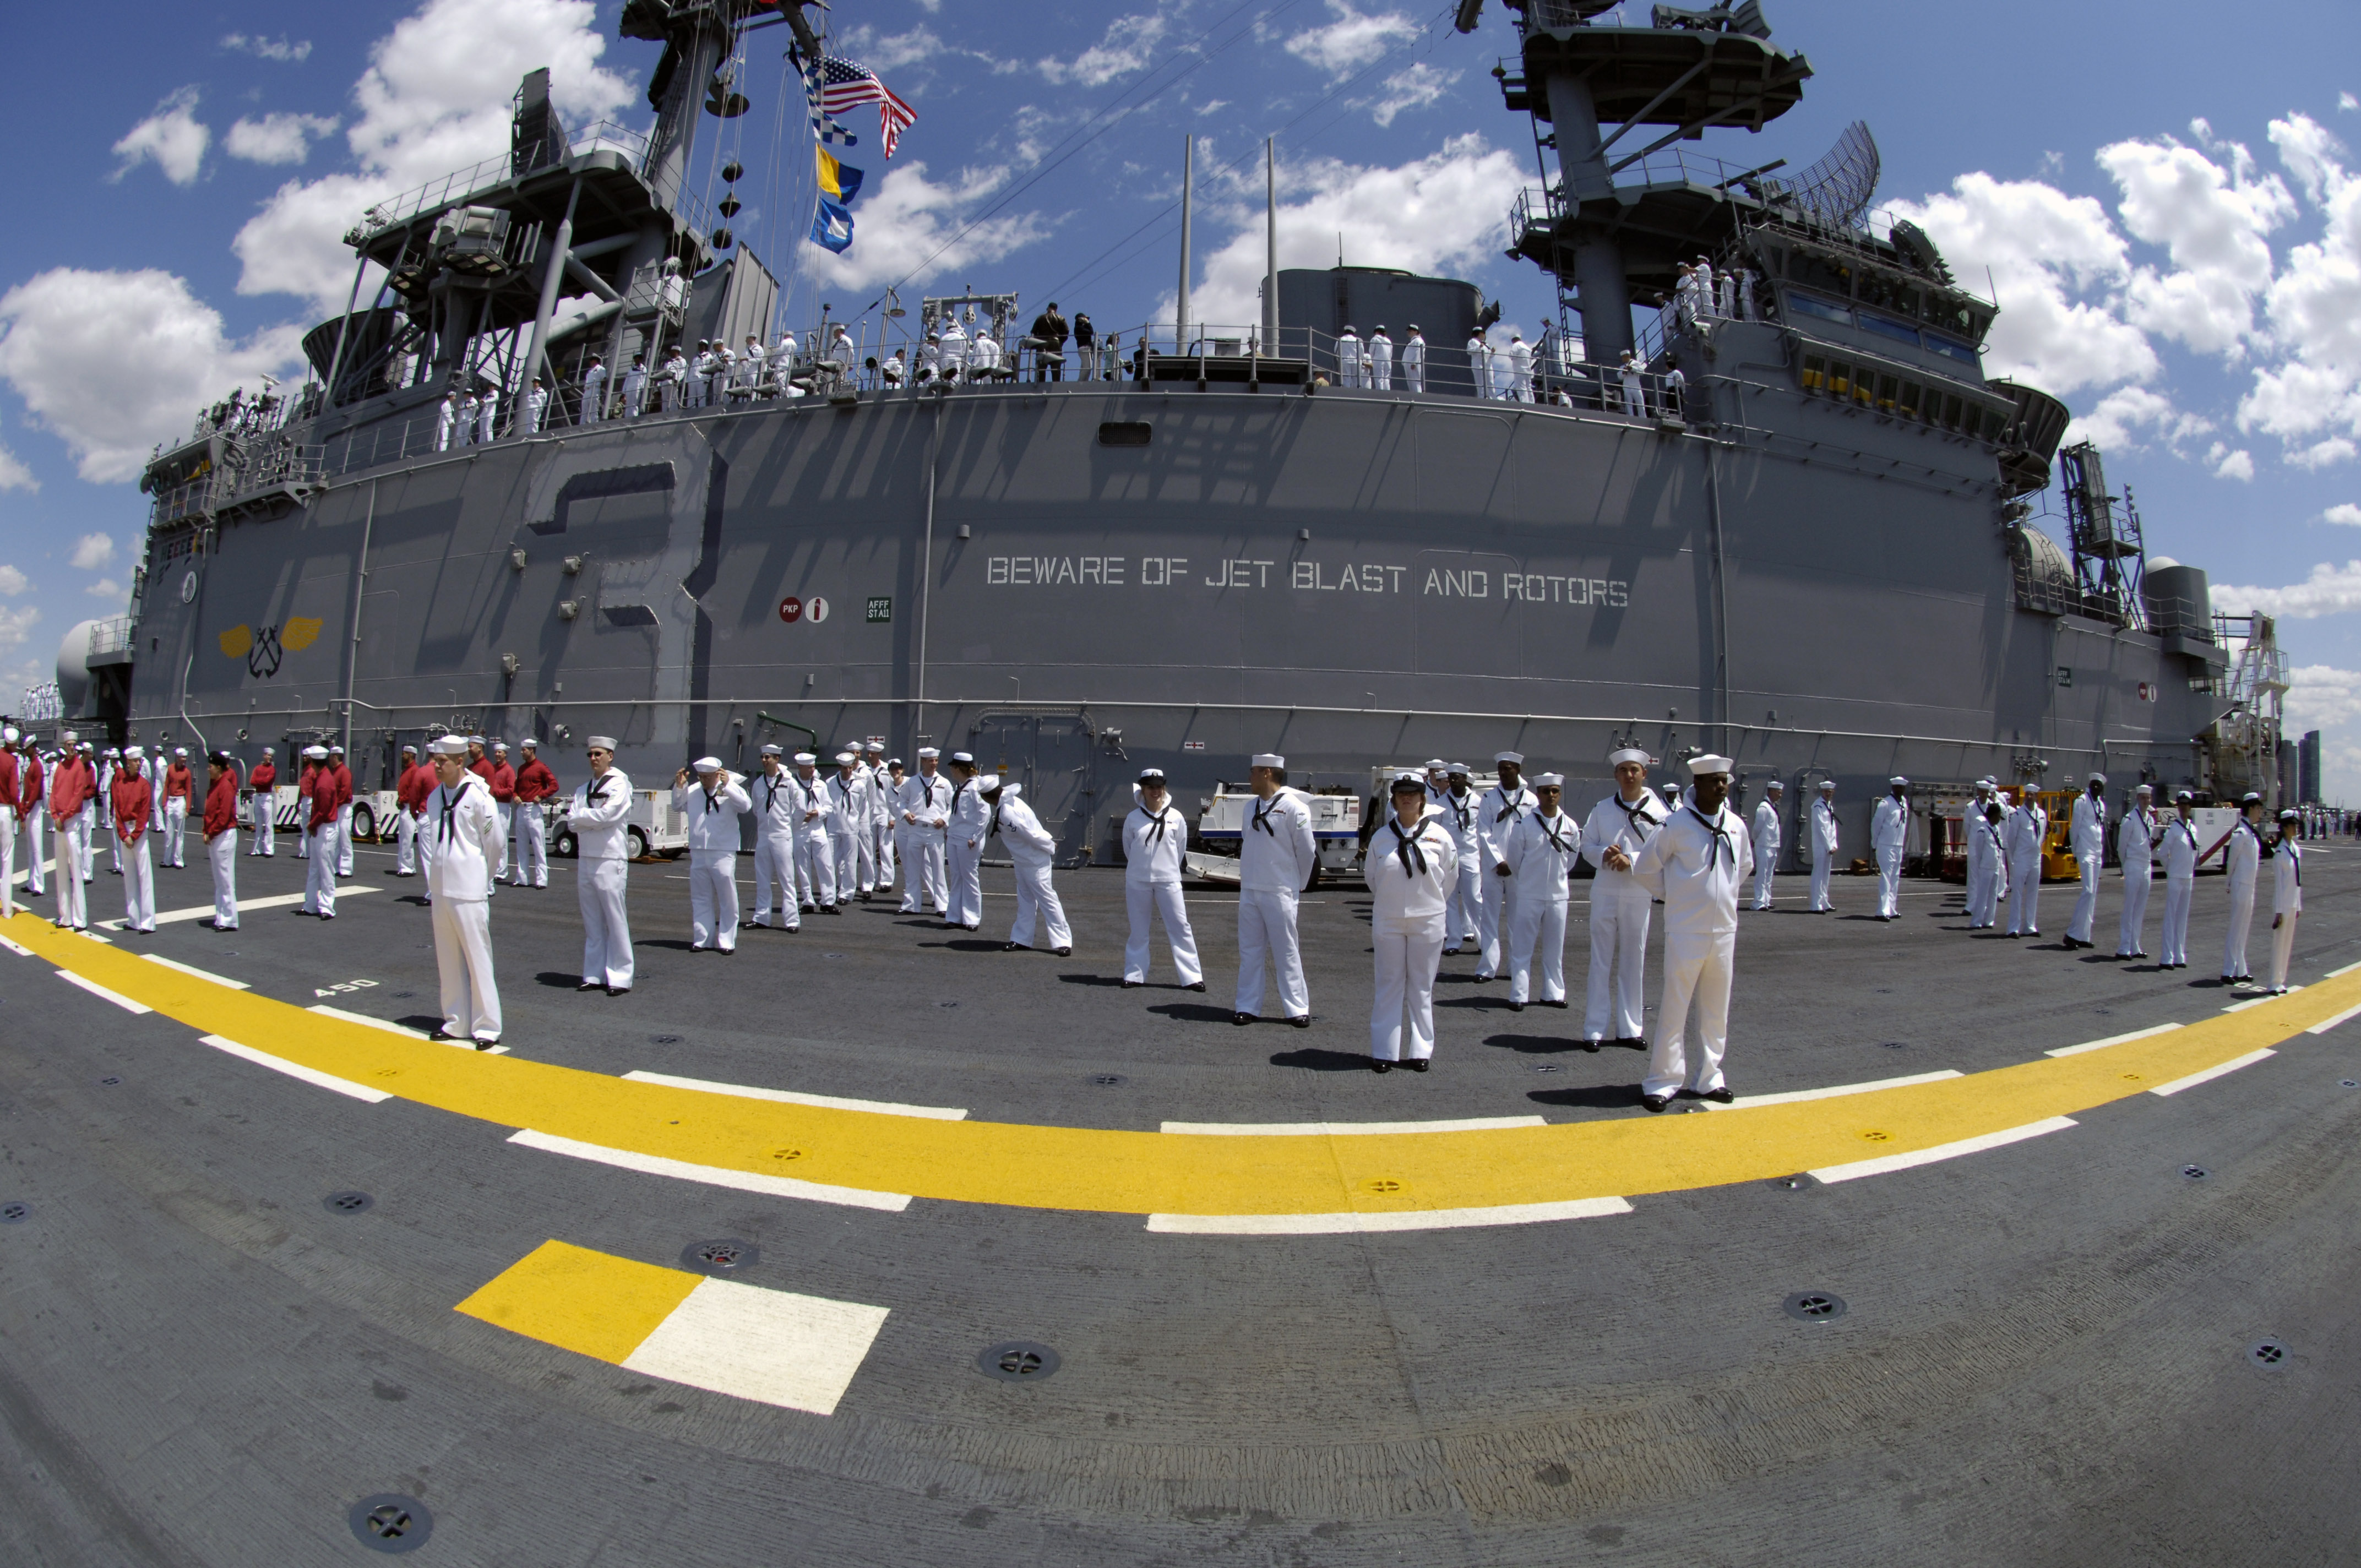 US_Navy_060524-N-7676W-119_ailors_man_the_rails_and_flight_deck_aboard_the_amphibious_assault_ship_USS_Kearsarge_%28LHD_3%29_as_she_arrives_for_the_start_of_Fleet_Week_New_York_City_2006.jpg